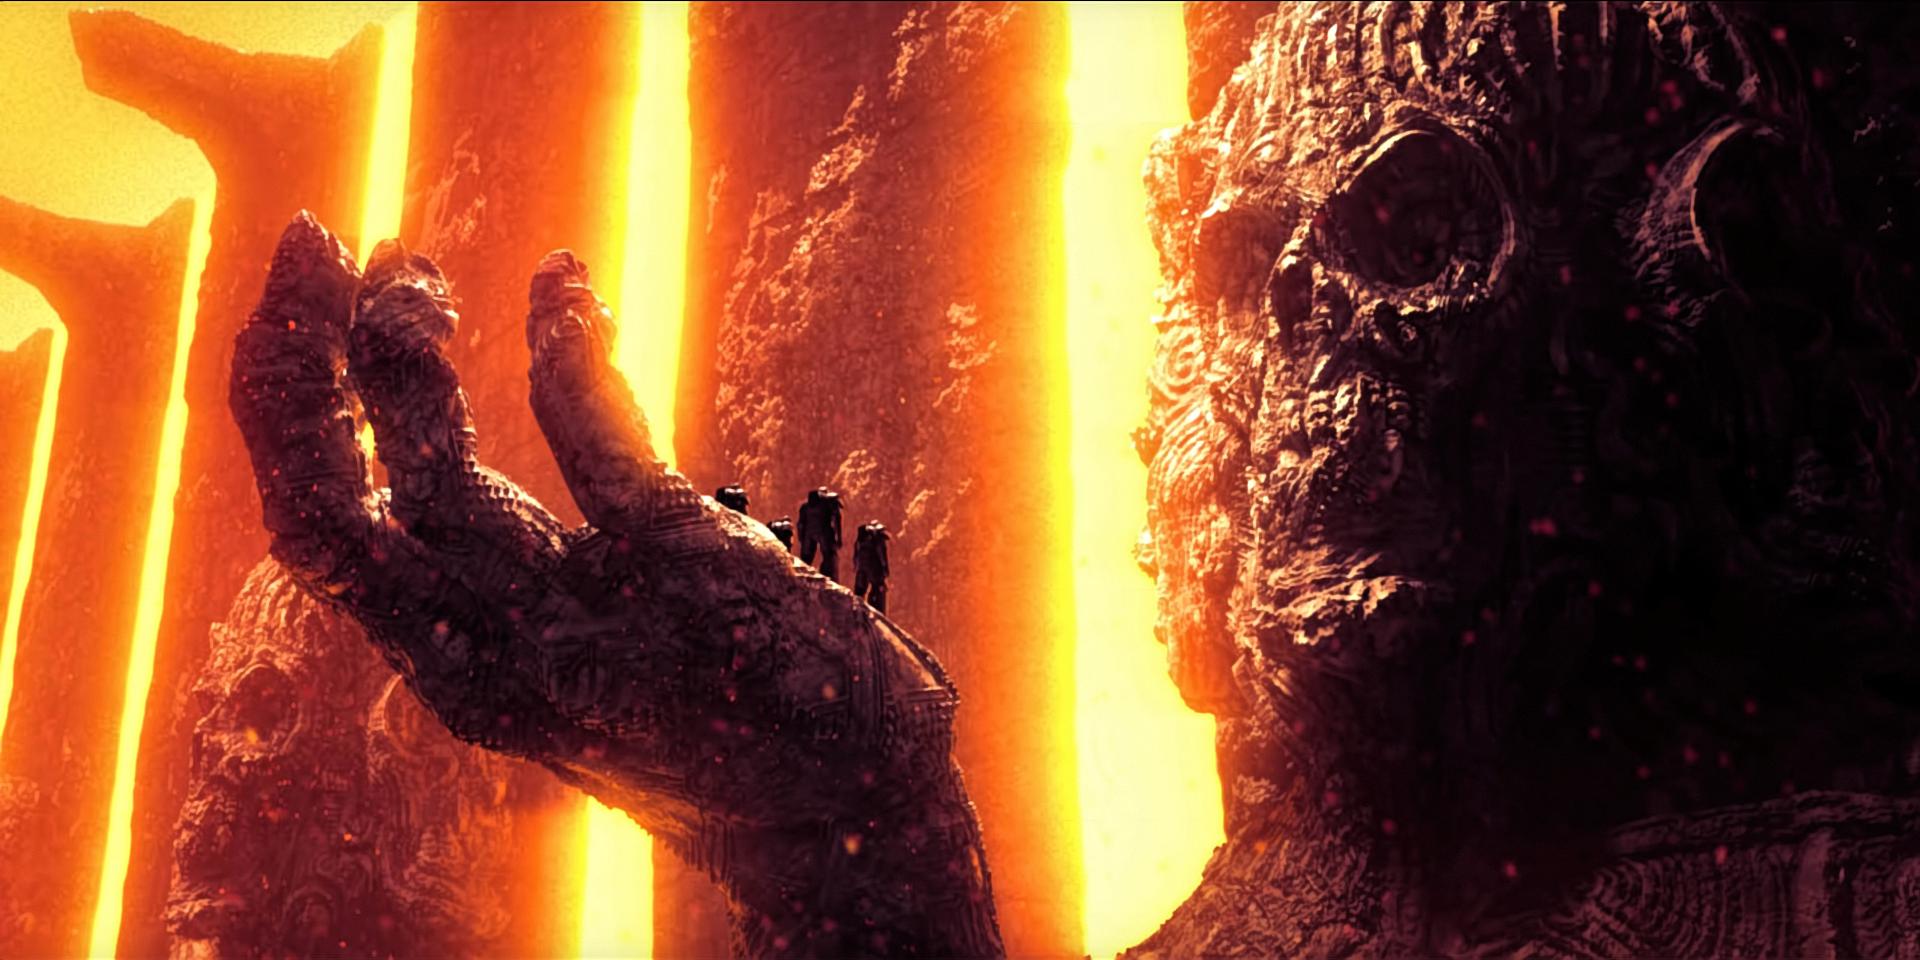 General 1920x960 Warhammer 40,000 Adeptus Astartes fantasy art lava sculpture Space Marine vivid colors yu'vath